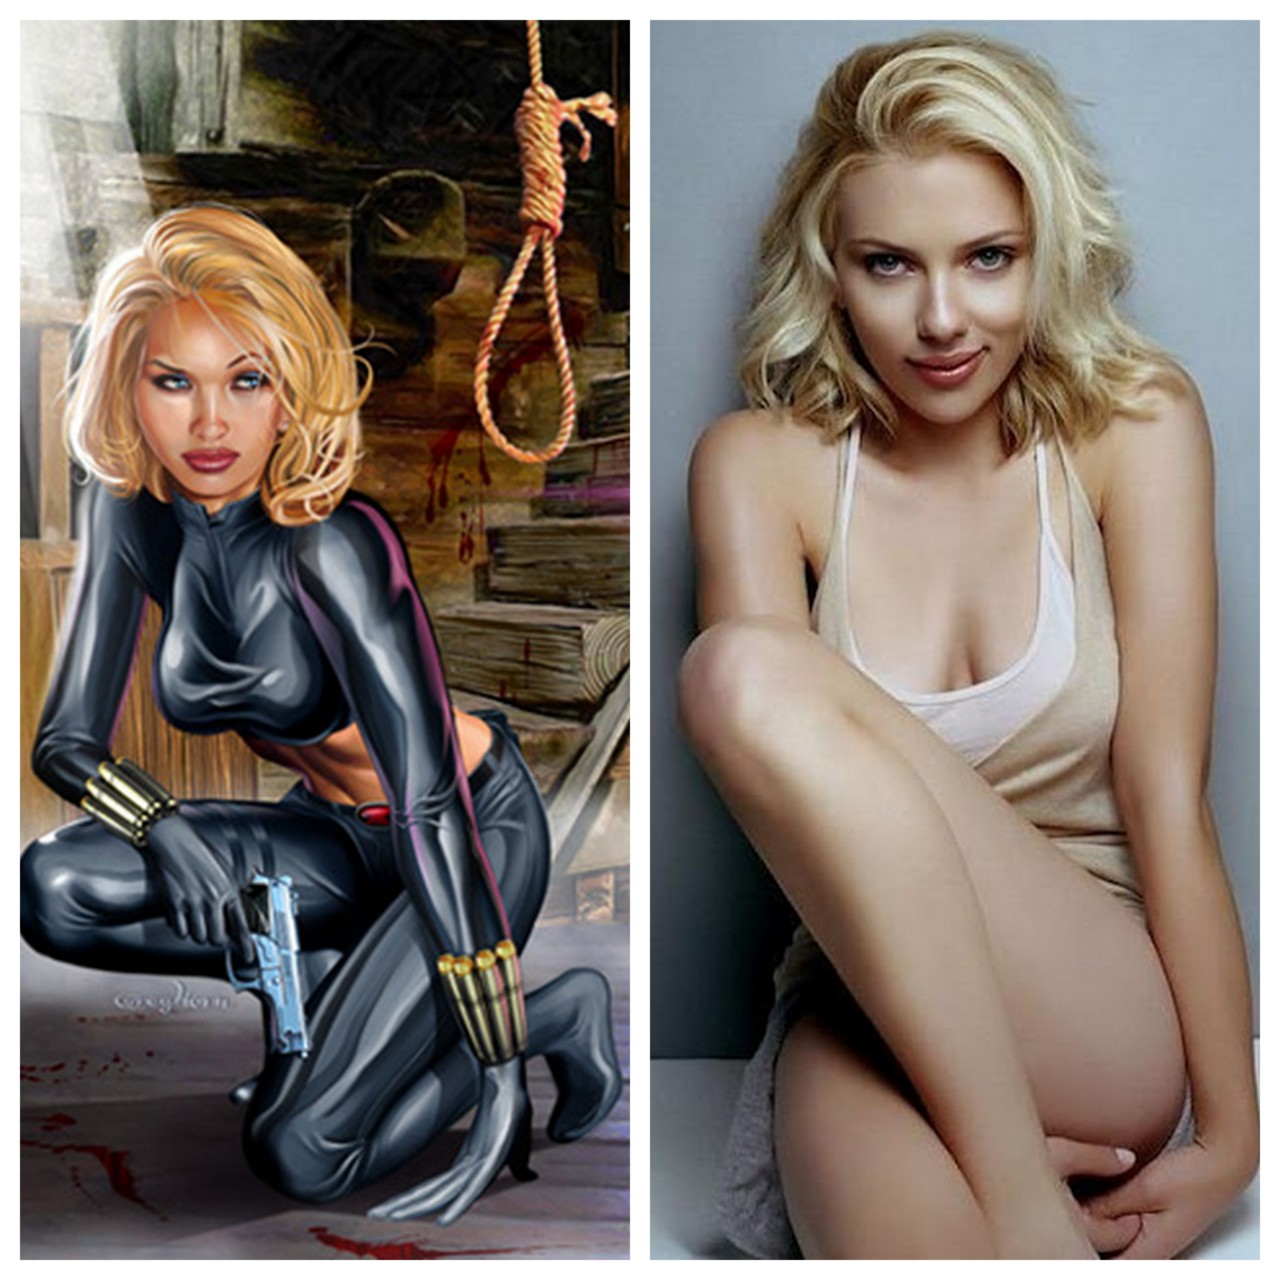 Yelena Belova vs. Scarlet Johannson